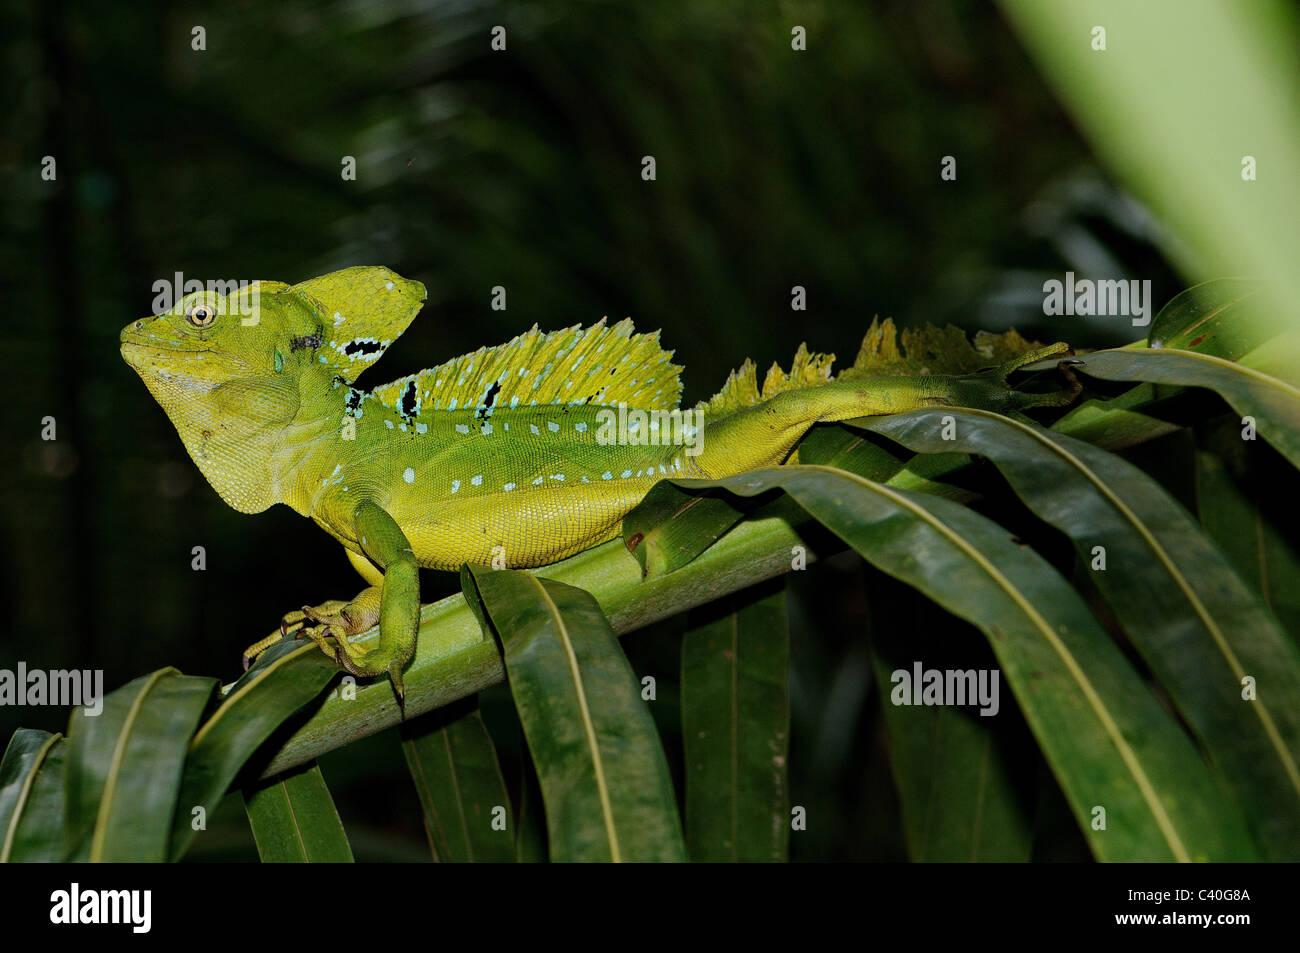 lizard, lizards, basilisc, plumed basilisc, Jesus Christ lizard, Basiliscus plumifrons, reptile, reptiles, scale, - Stock Image